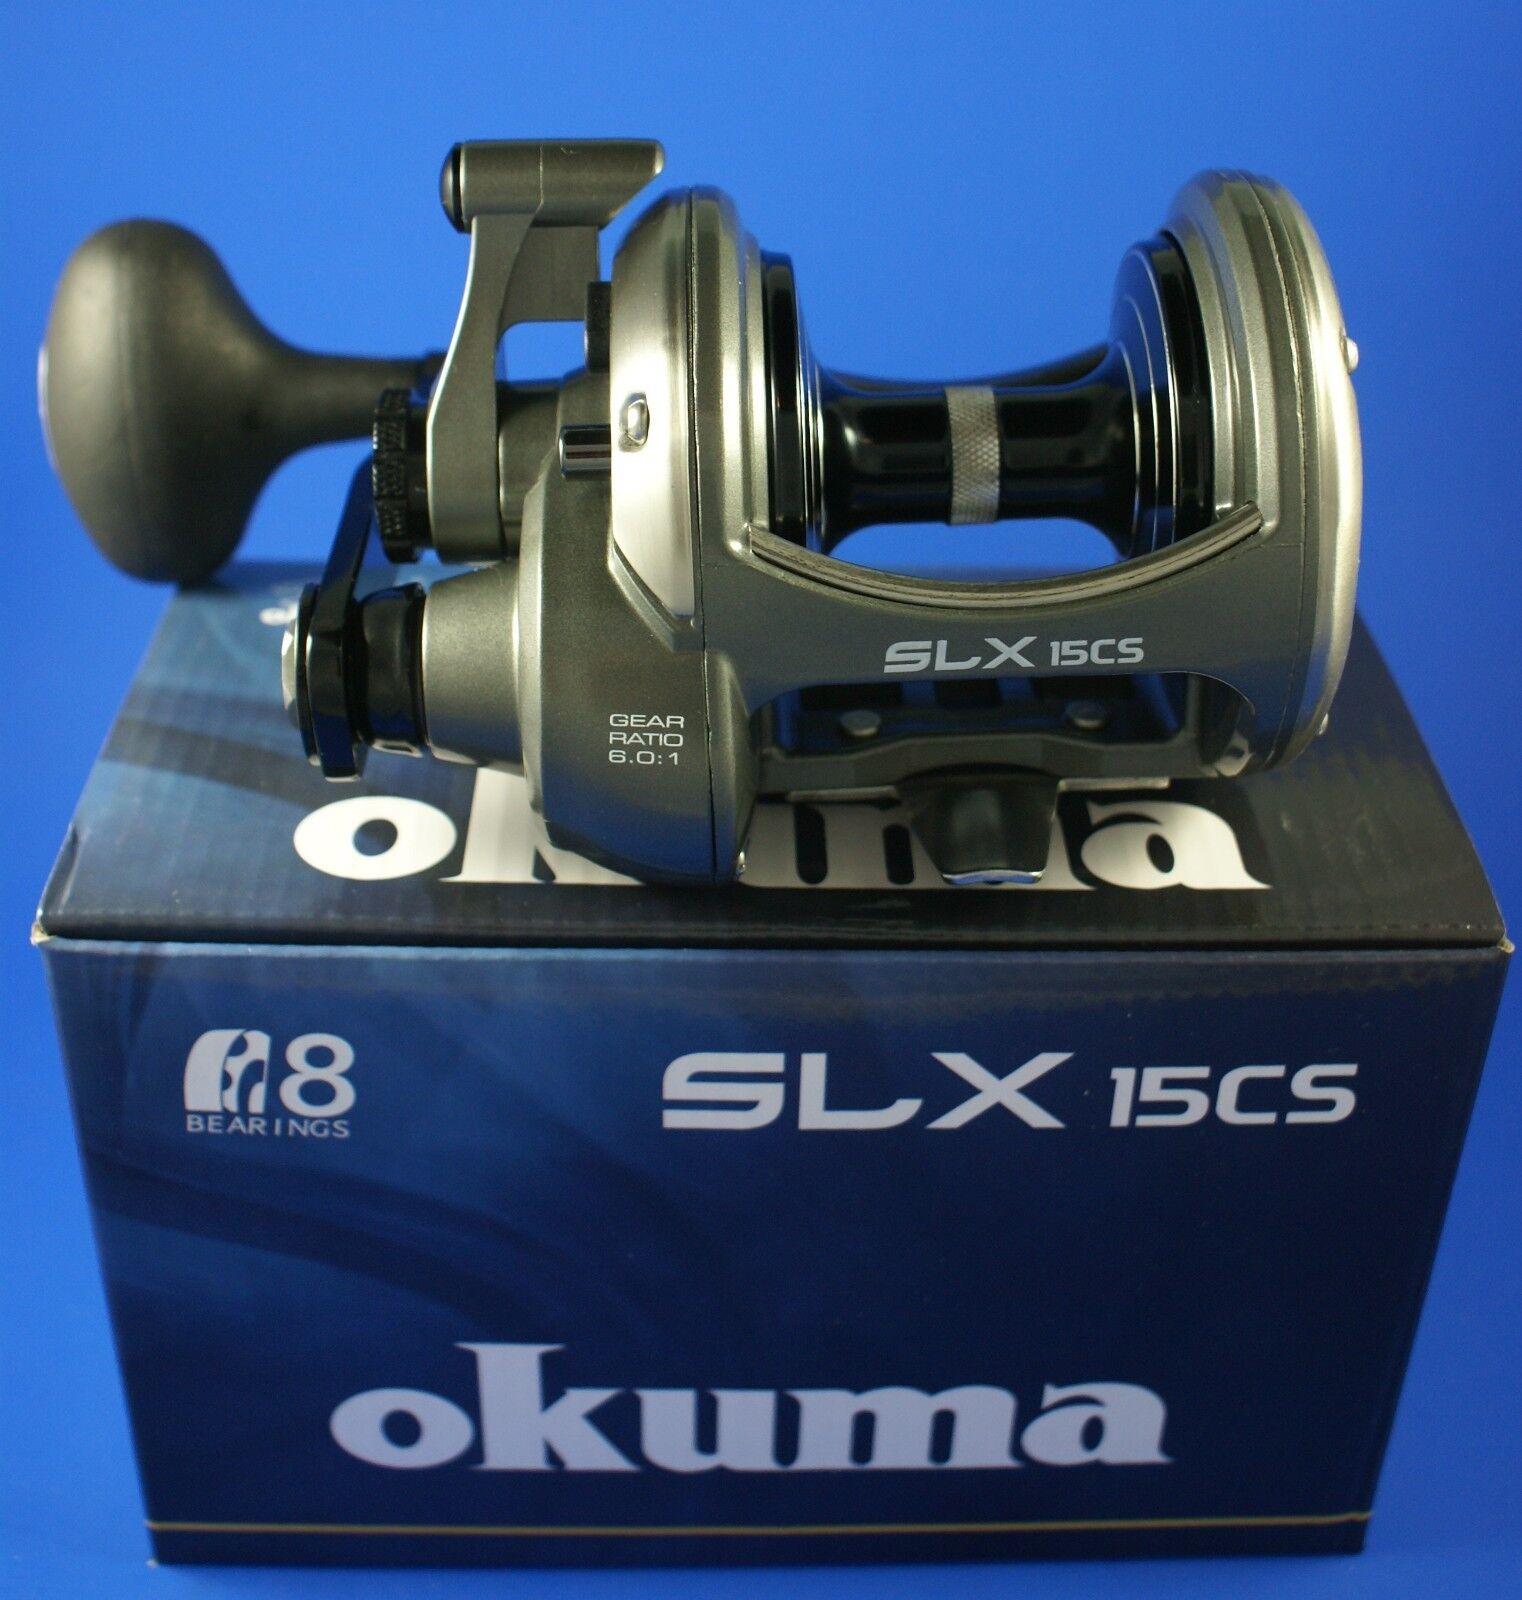 Okuma Drag Solterra SLX-15CS Lever Drag Okuma Fishing Reel 363a6e